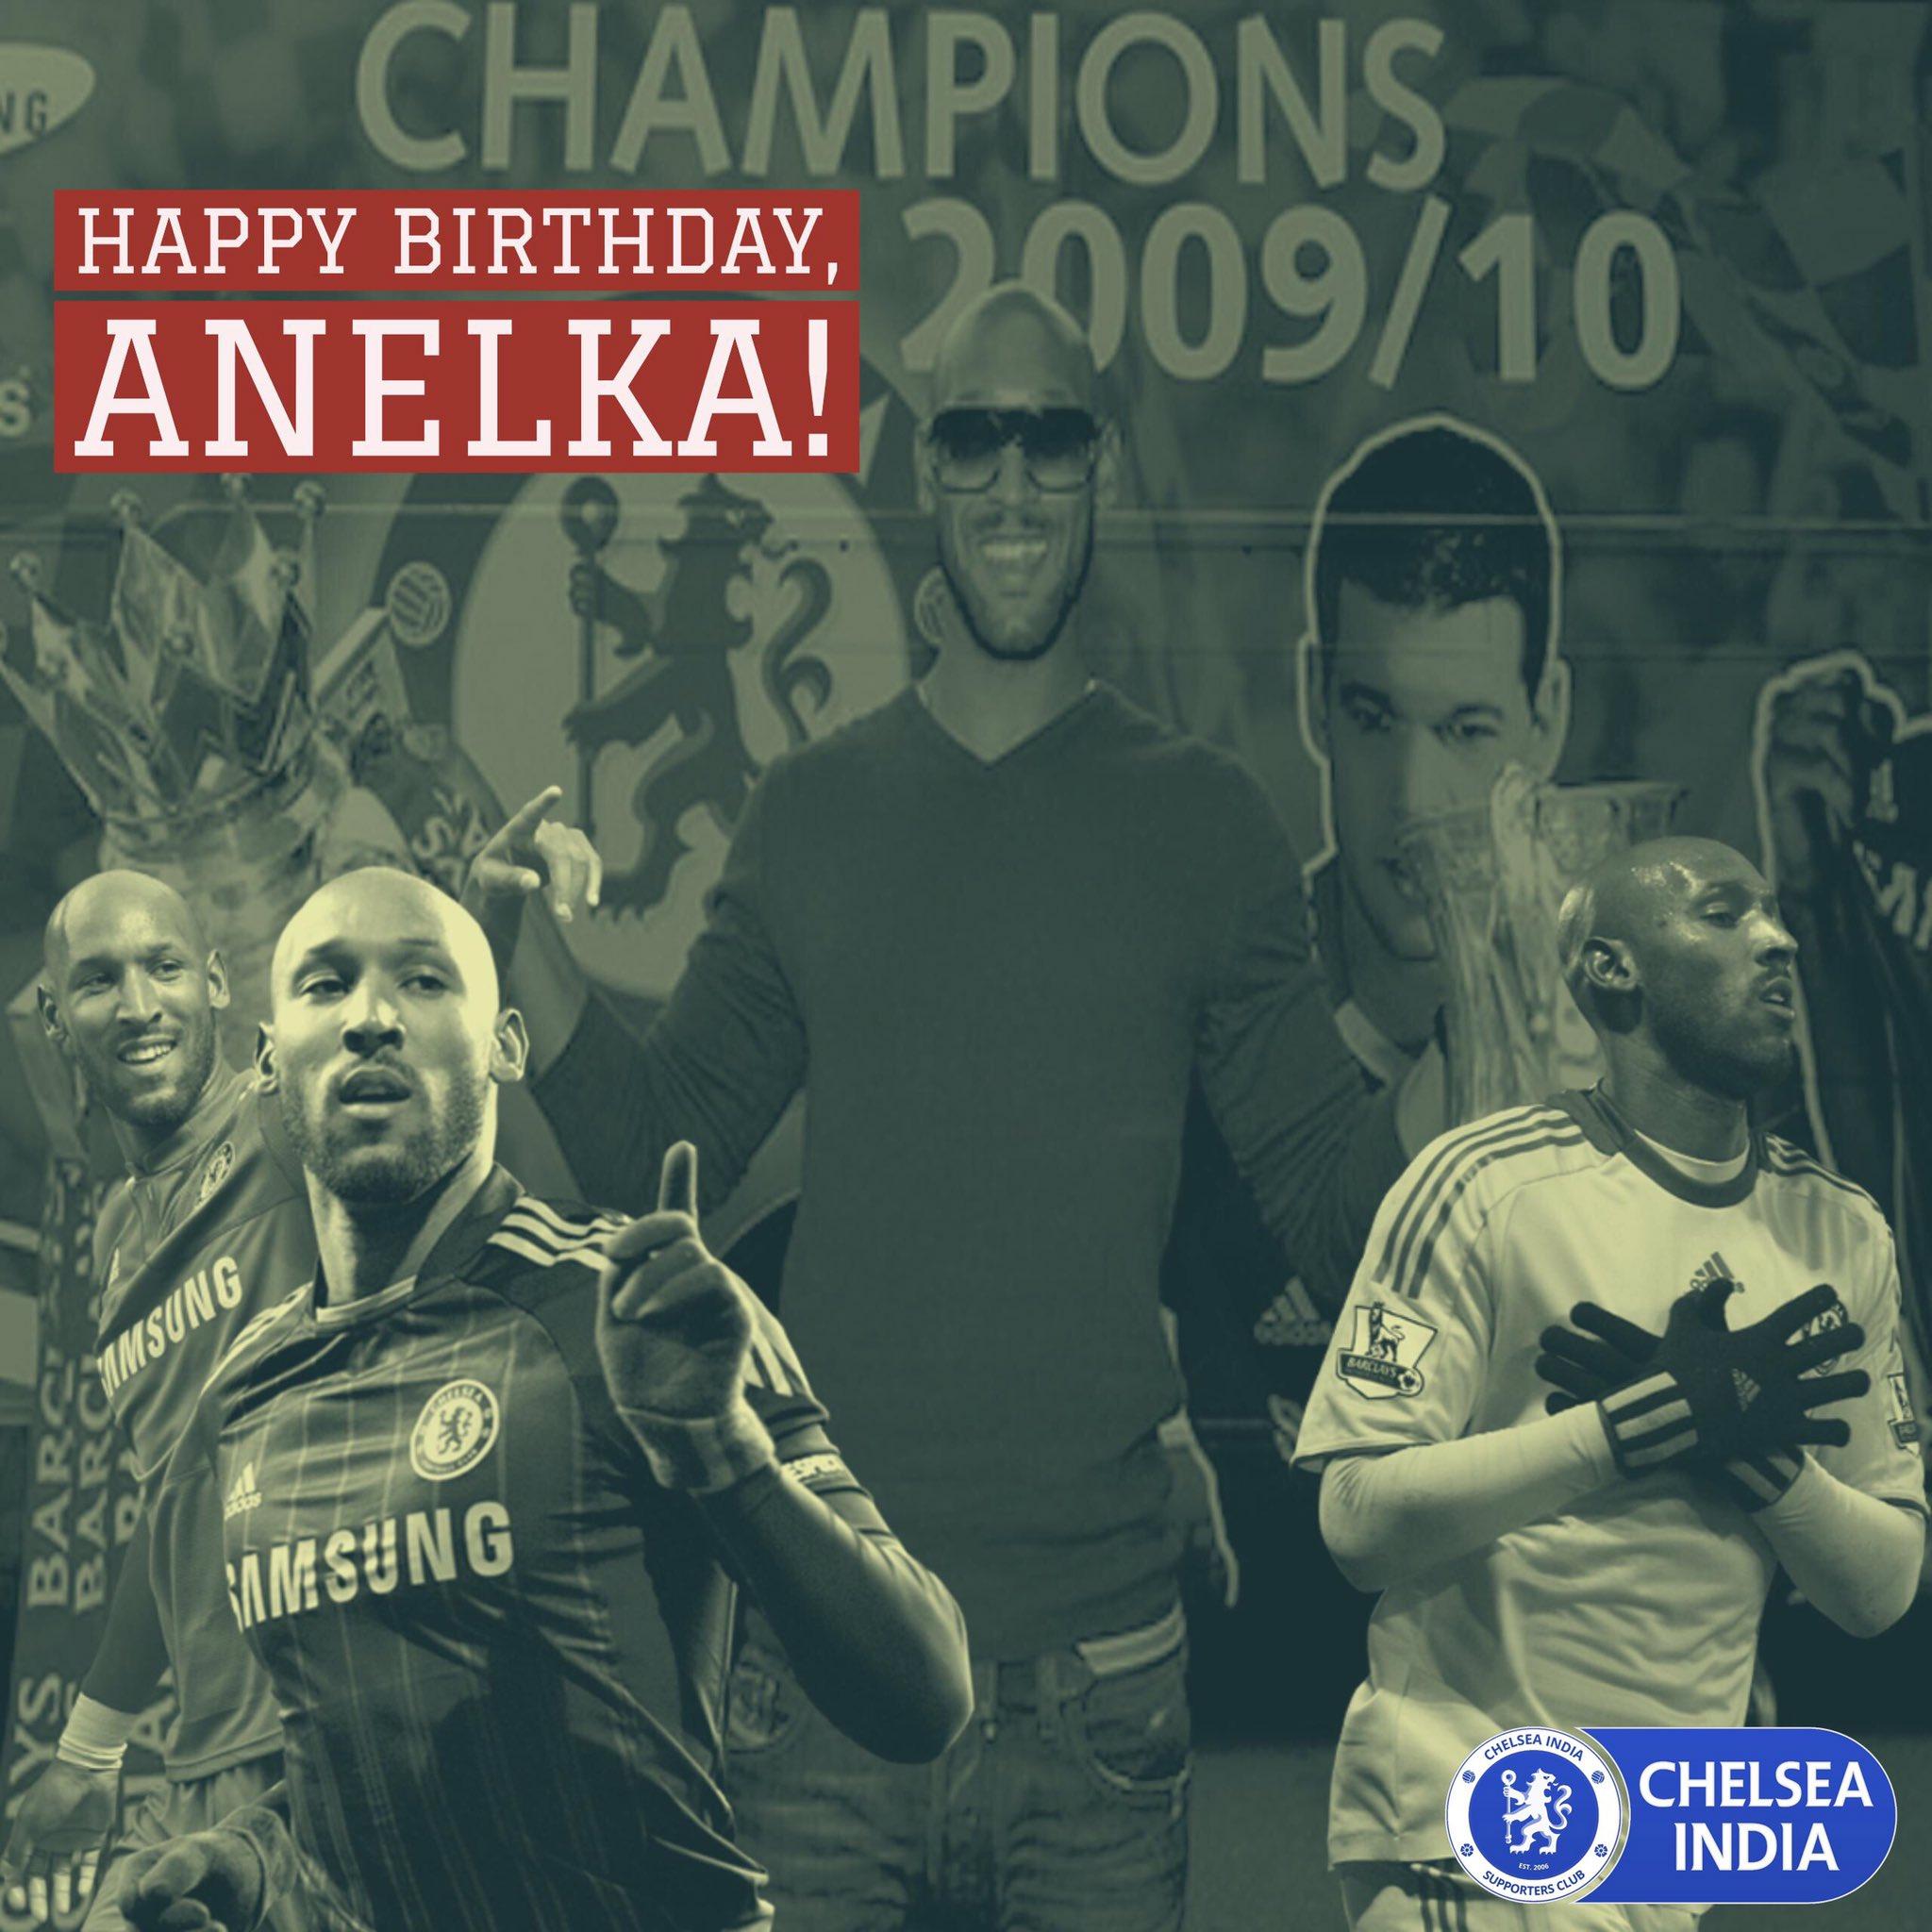 We wish a very happy birthday to former Blue Nicolas Anelka!